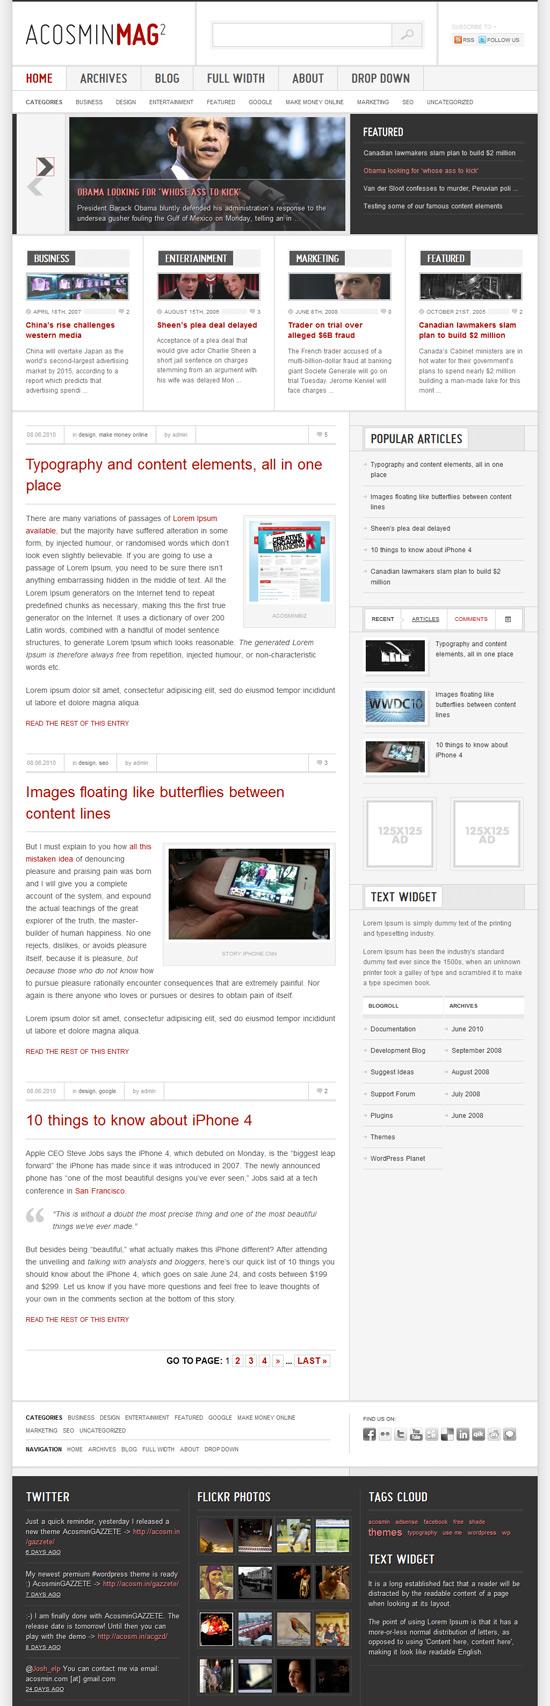 Acosmin Mag2 szablon wordpress